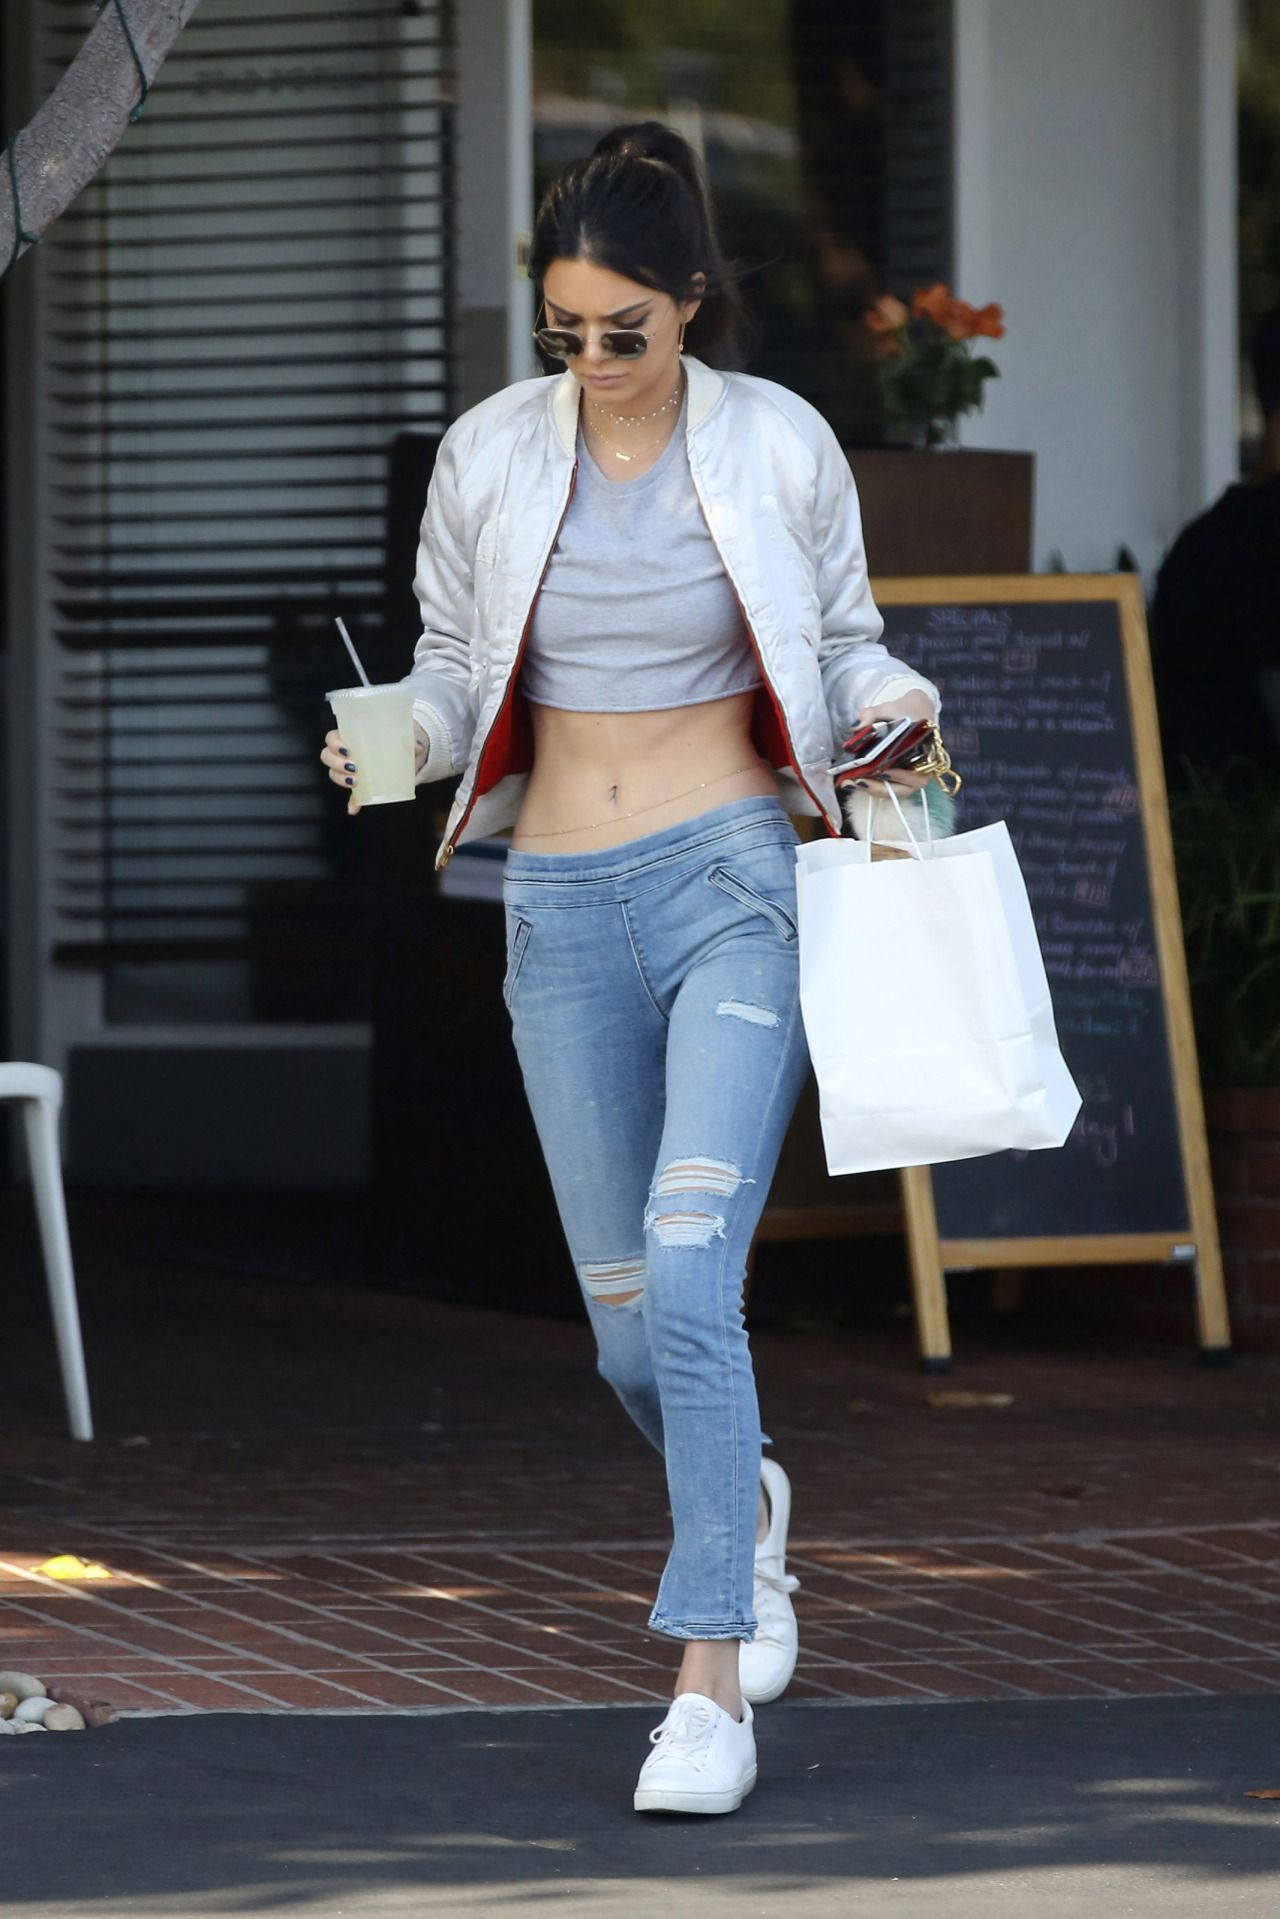 45897f88f1e Kylie & Kendall | Kendall jenner ❤ | Kendall jenner, Kendall jenner ...